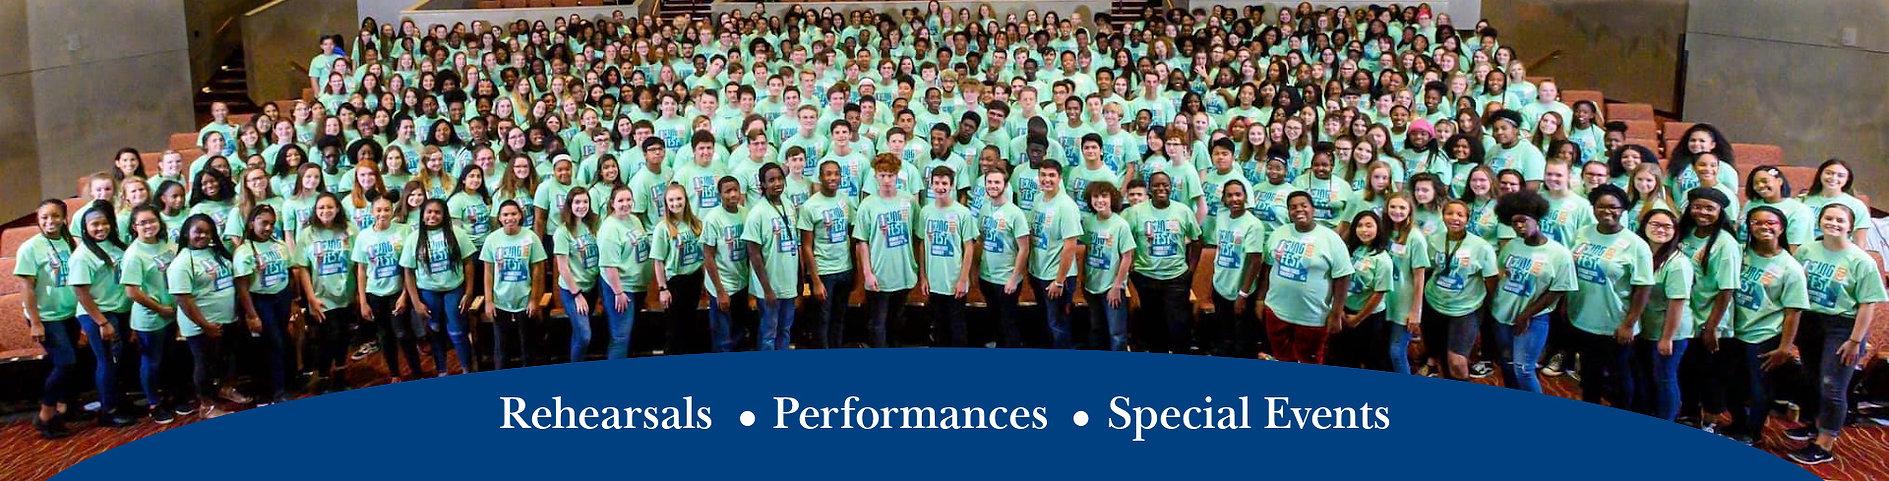 performances hero new.jpg